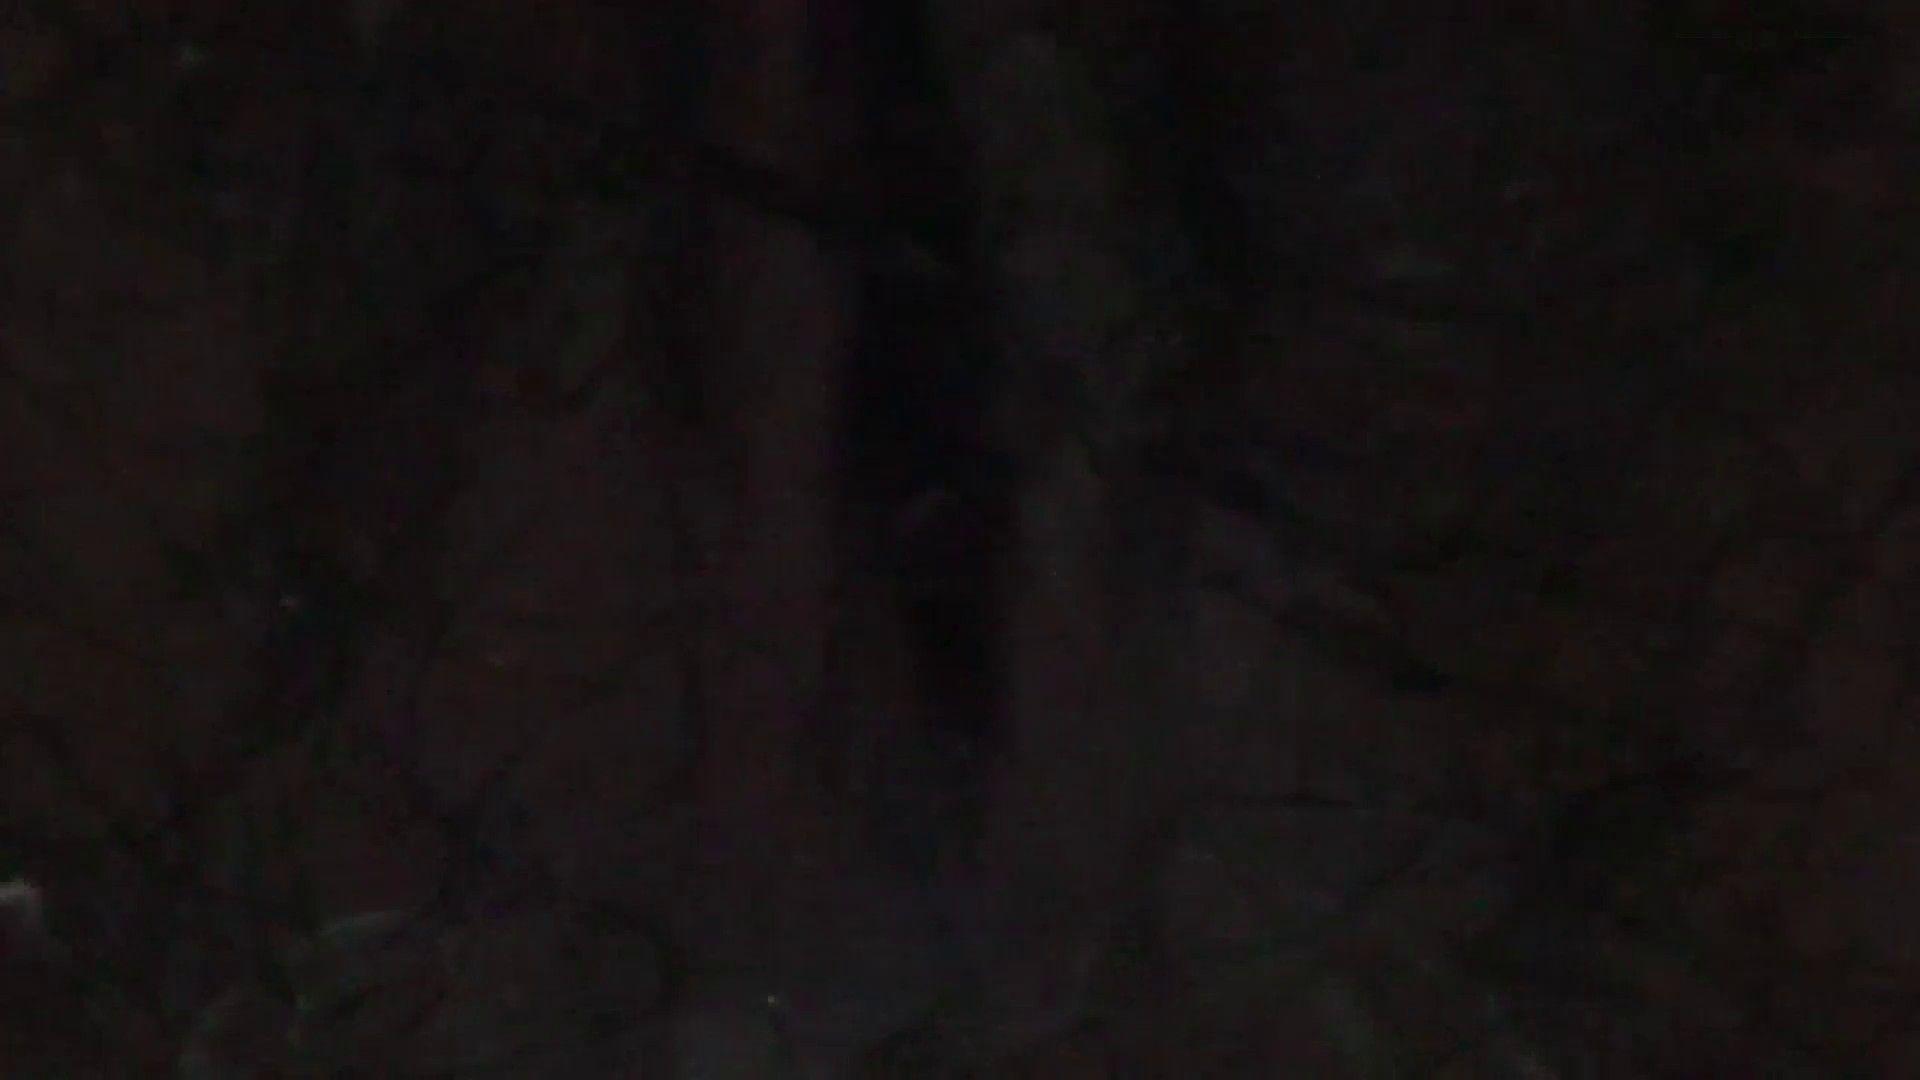 JD盗撮 美女の洗面所の秘密 Vol.58 細身女性 エロ画像 56画像 49